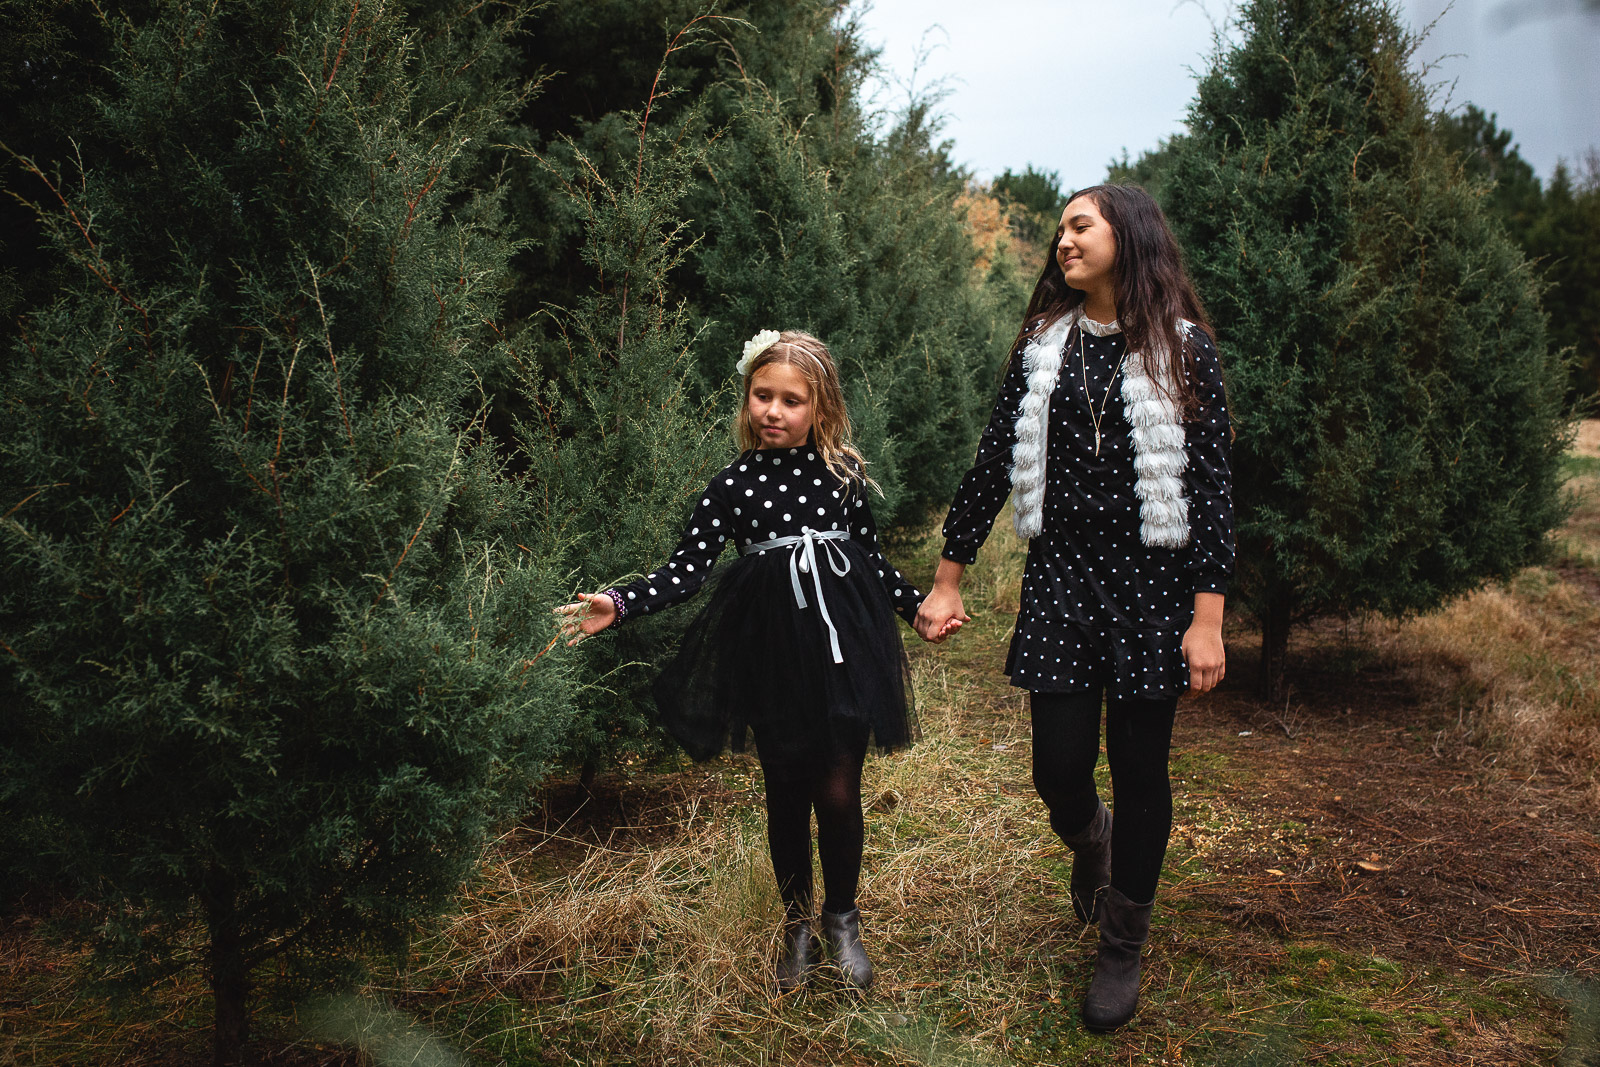 Outdoor Lifestyle Family Photo Session At Christmas Tree Farm